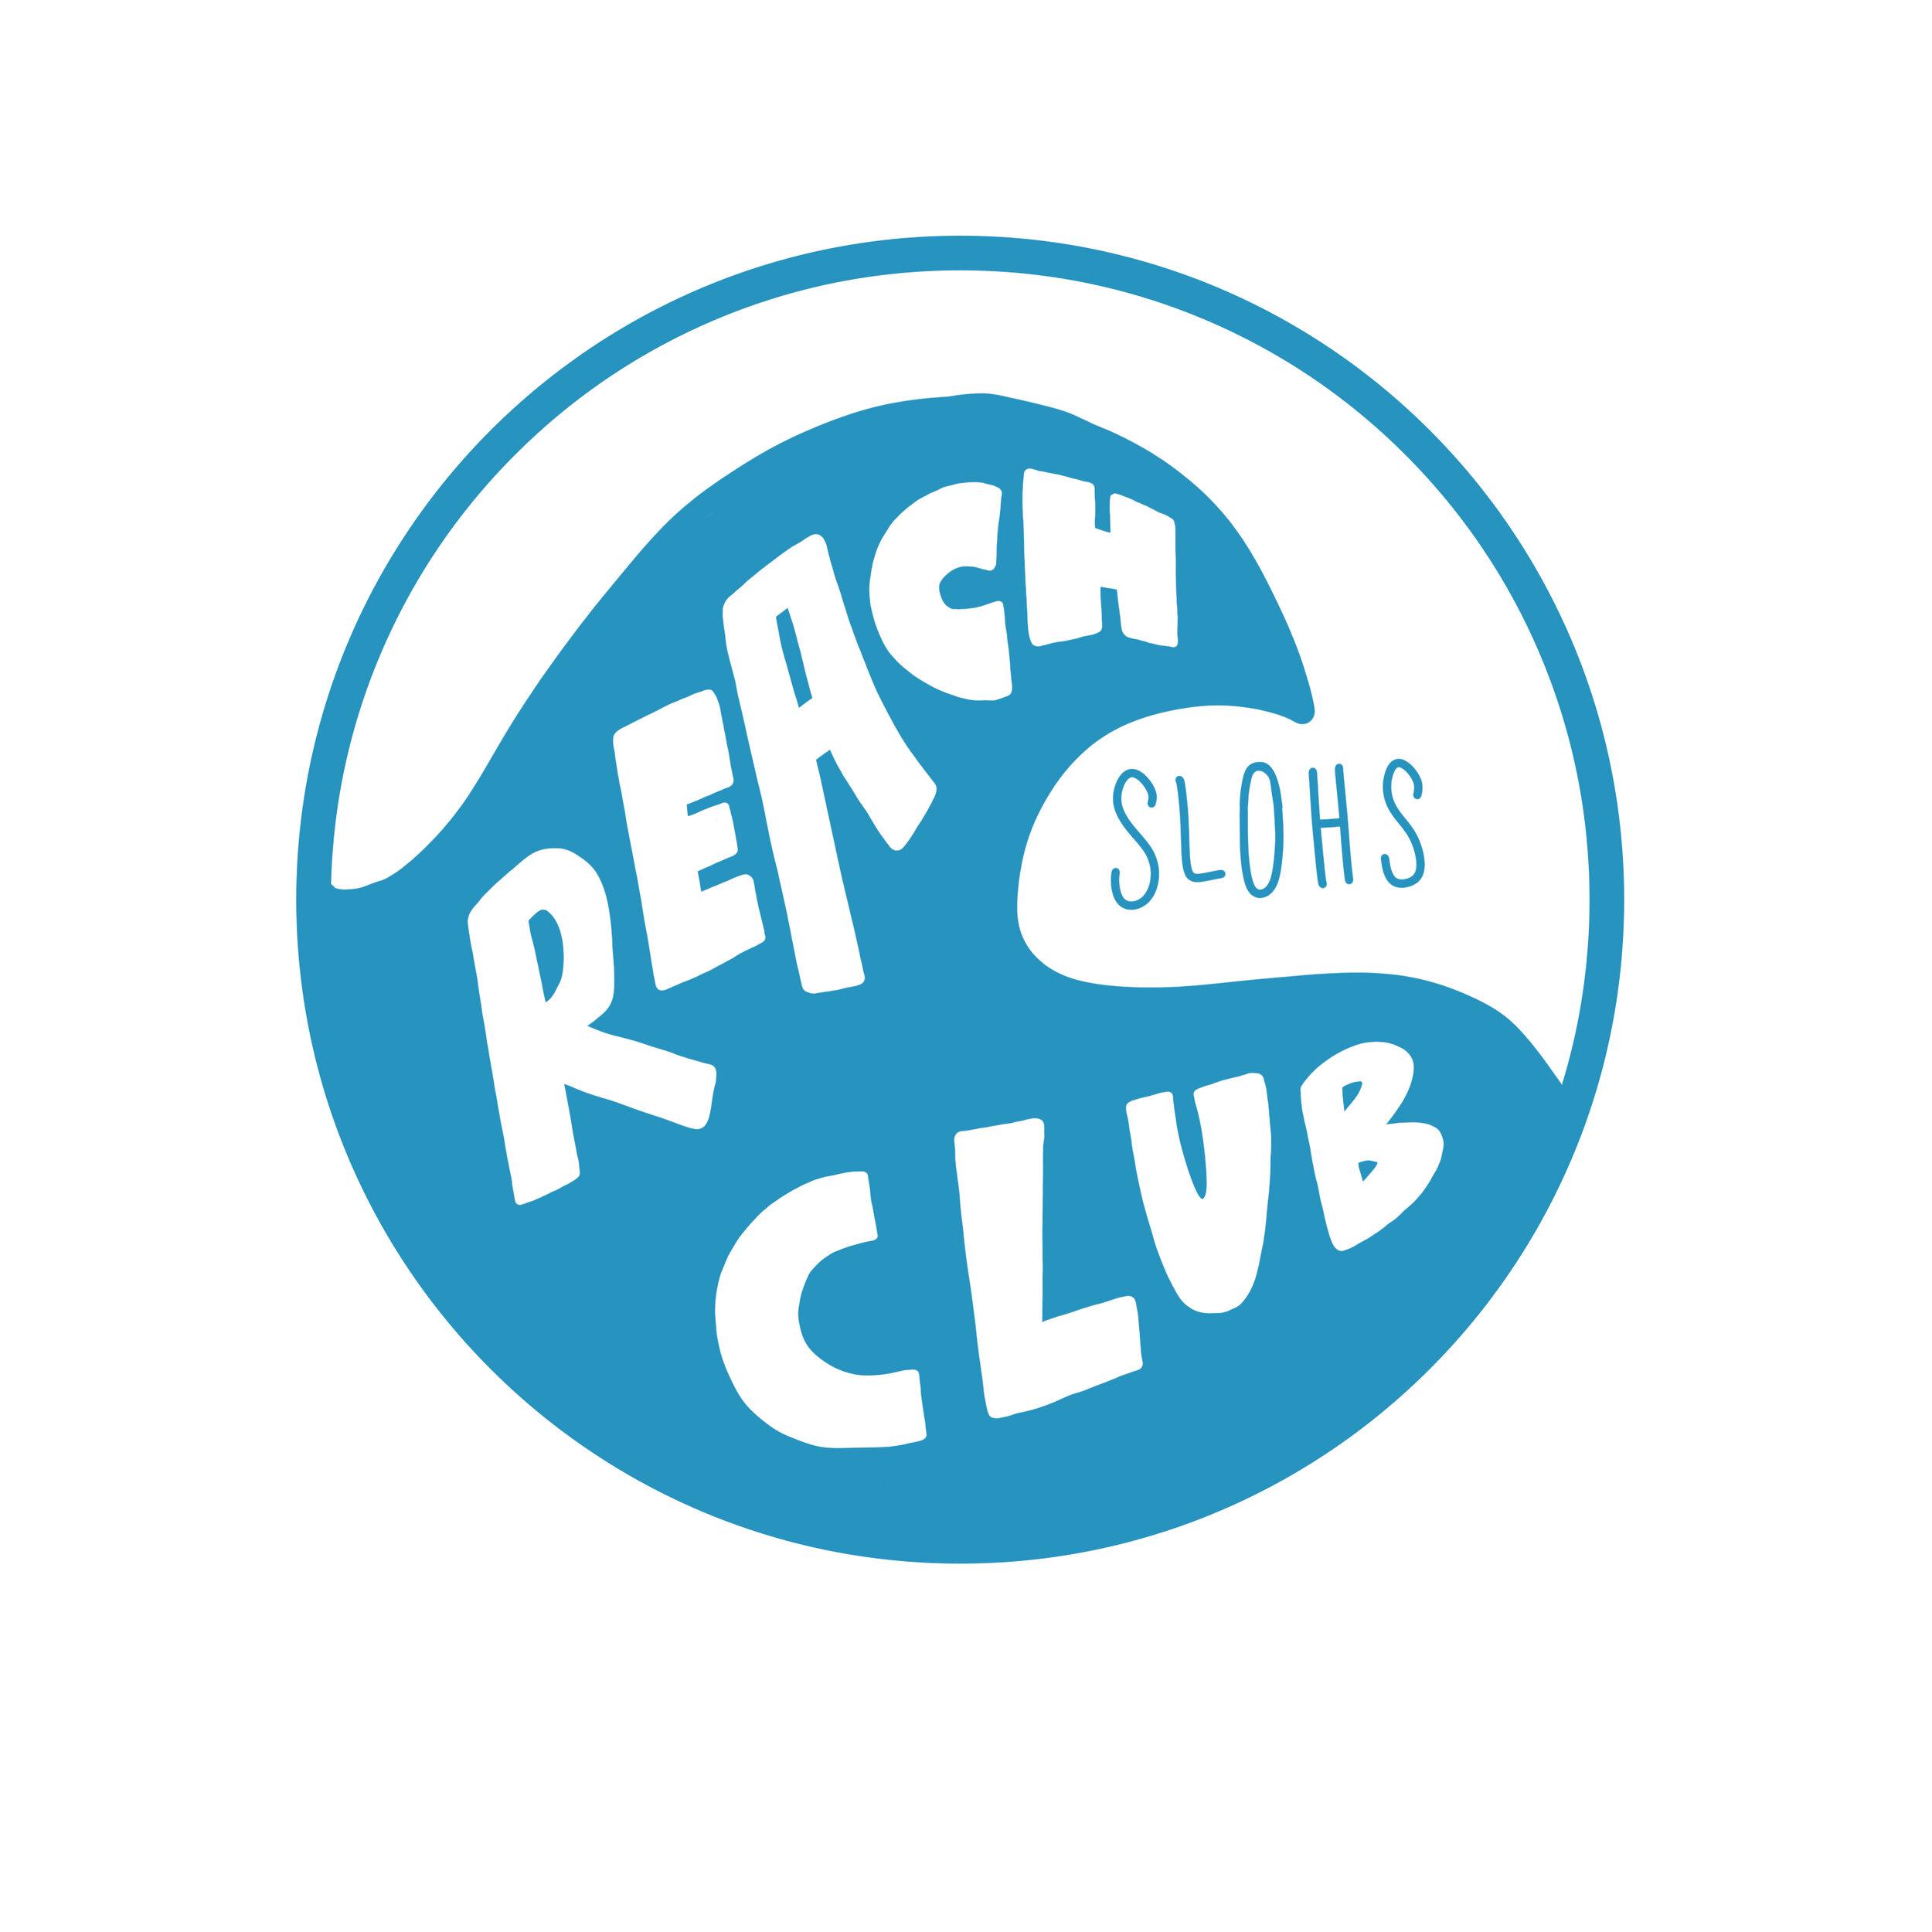 reach club 4 small c.jpg